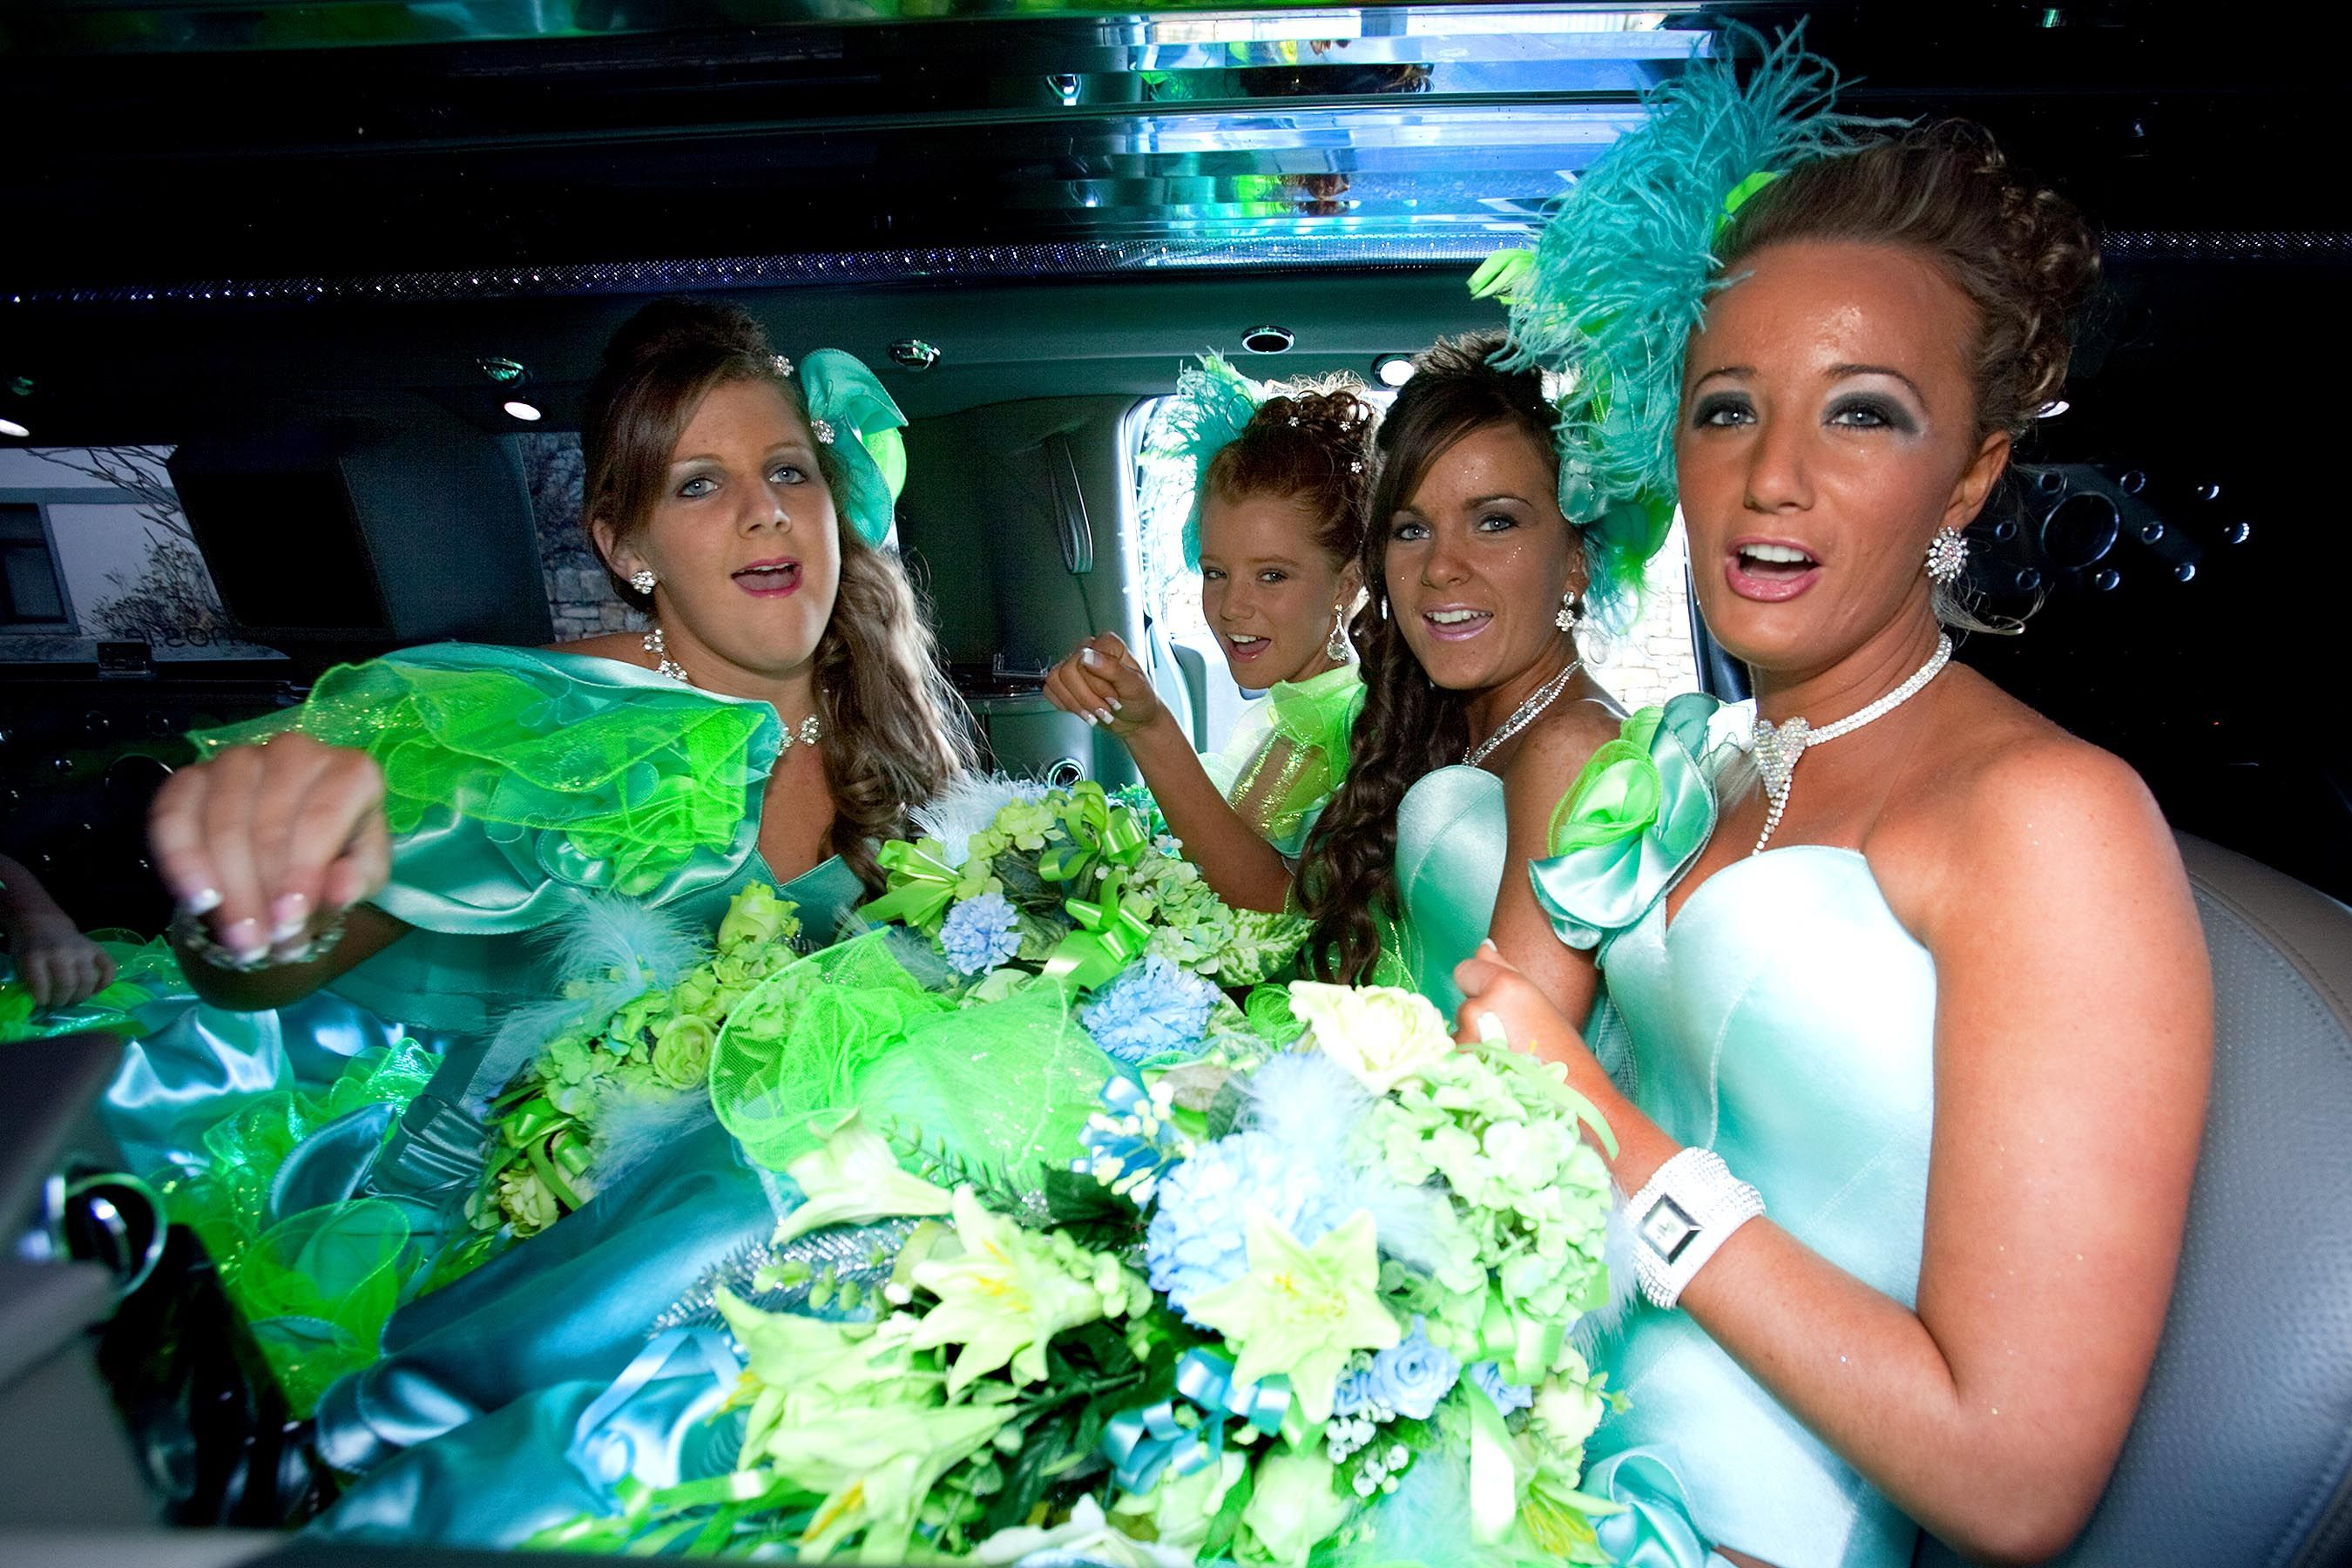 Big Fat Gypsy Wedding.Gypsy Groups Angry With Channel 4